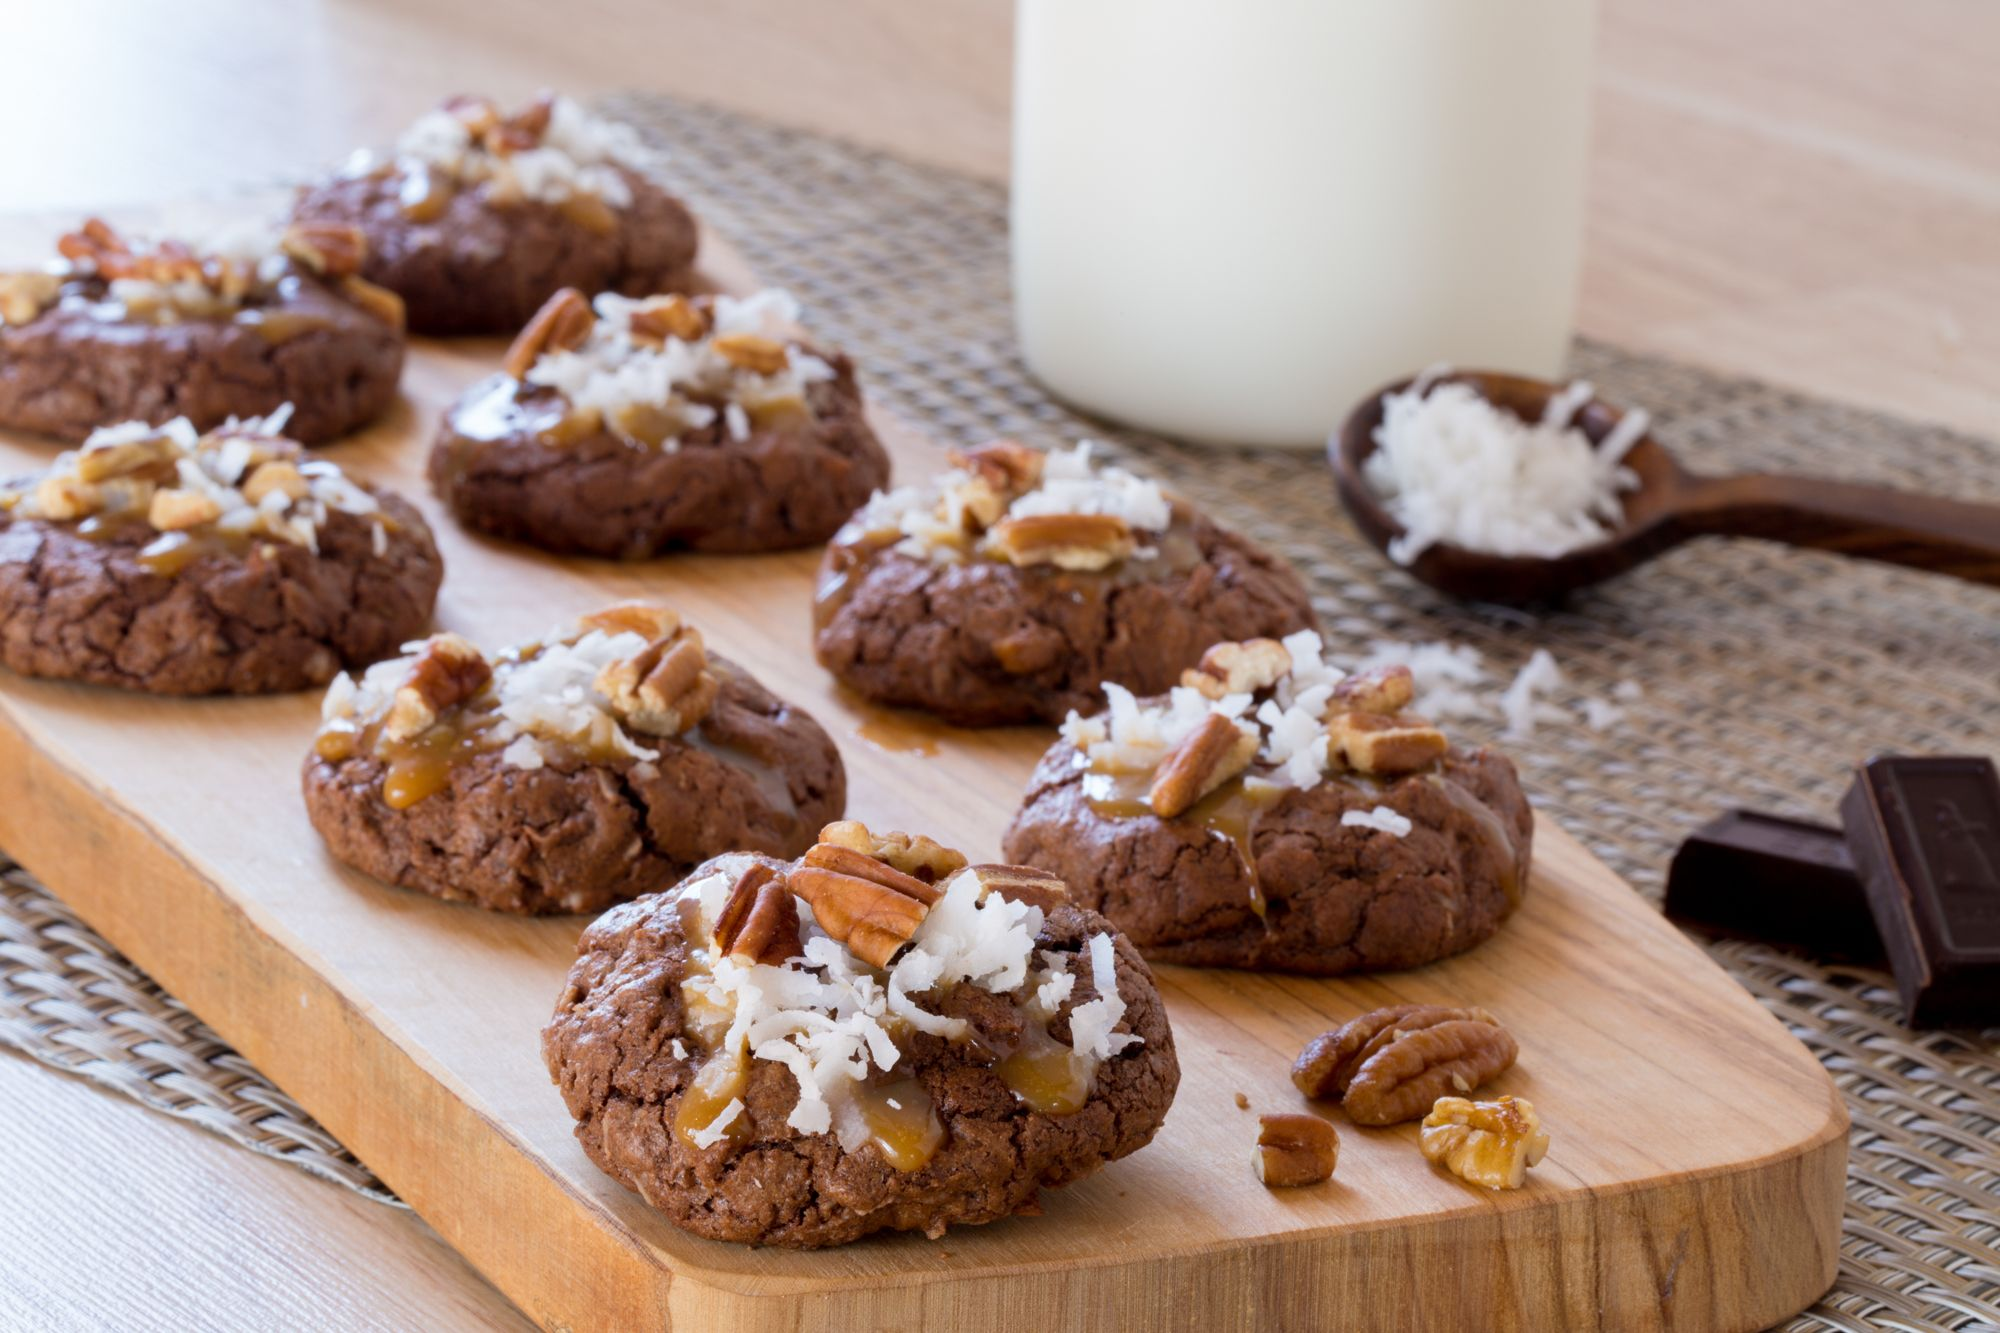 Baker's Chocolate Cookies